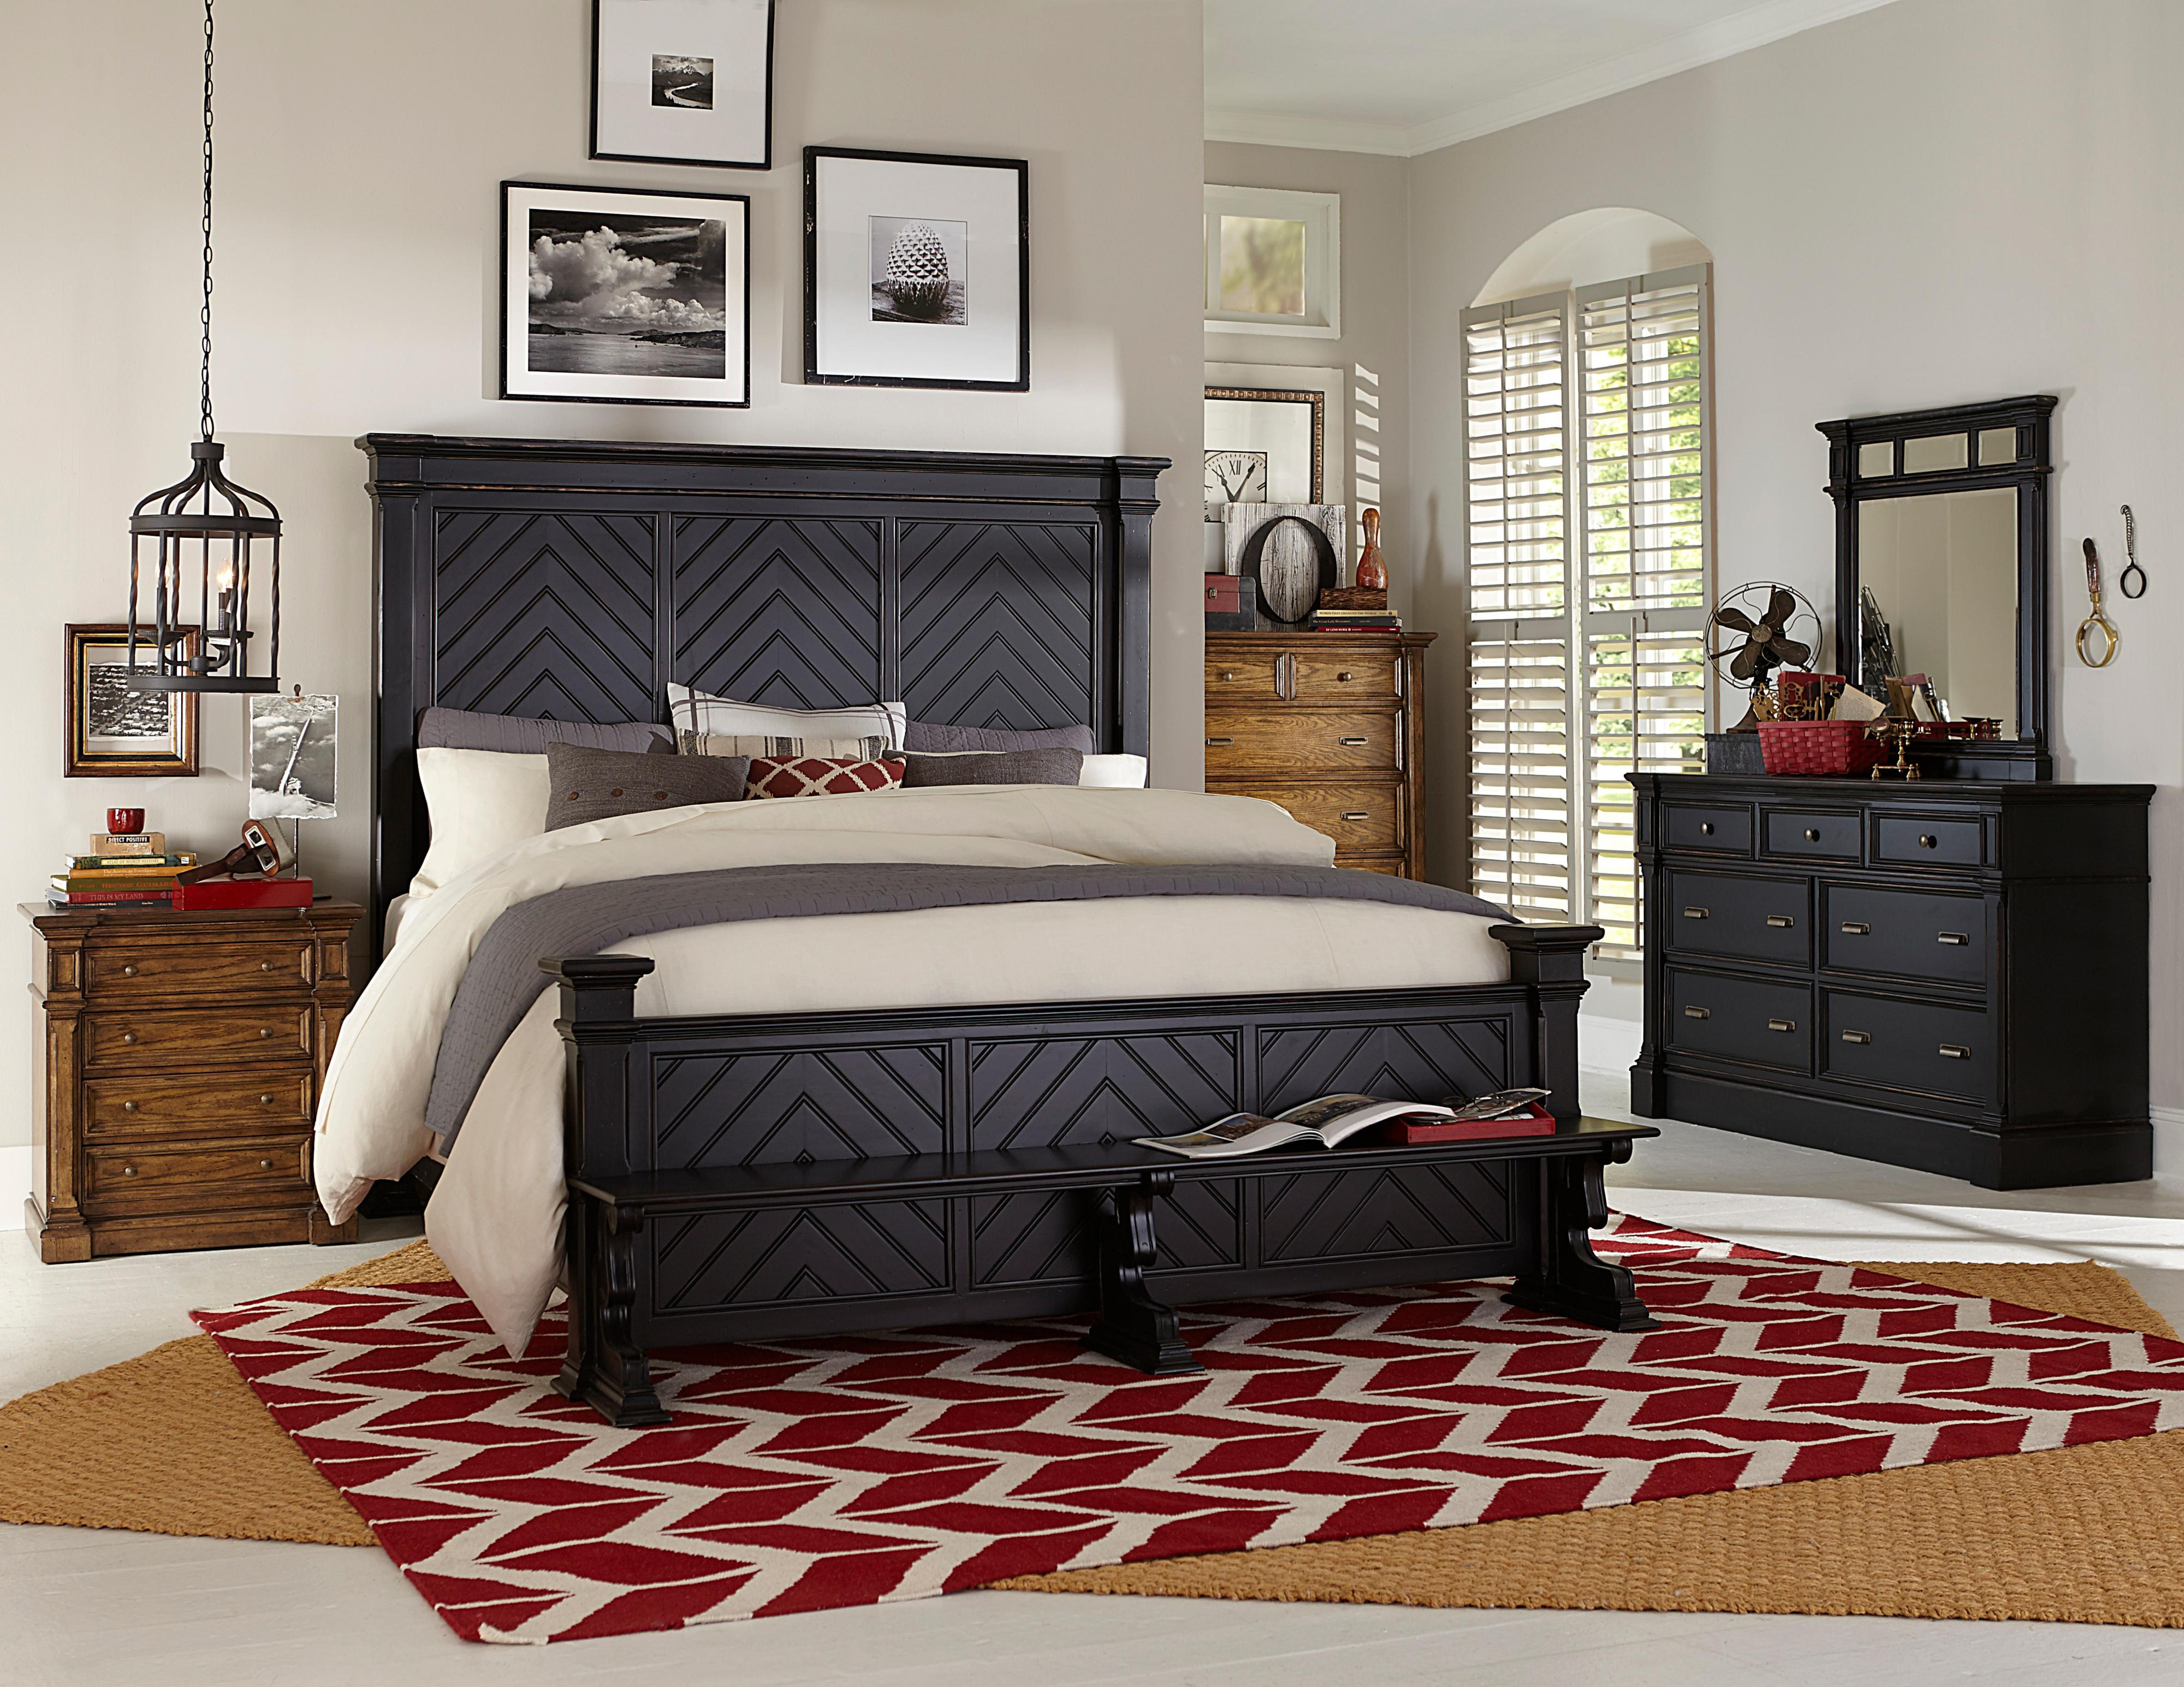 Delightful King Chevron Bed